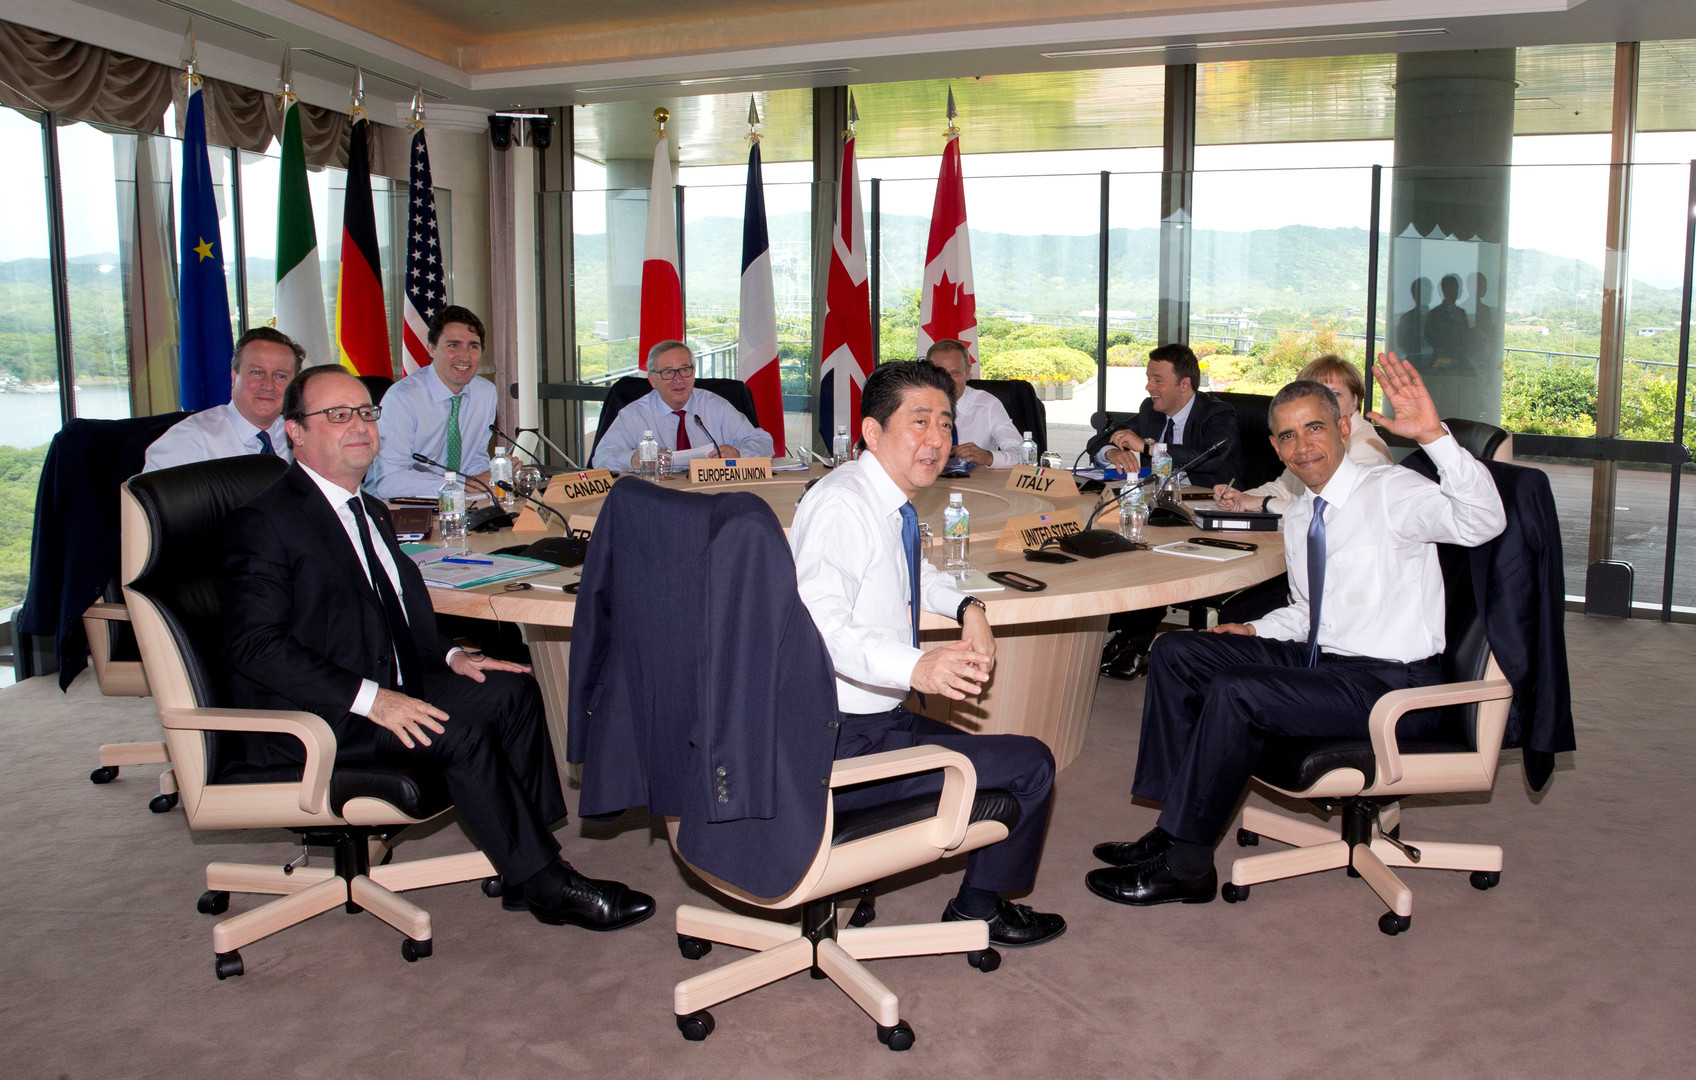 От антироссийских санкций до реформ на Украине: о чём говорили на саммите G7